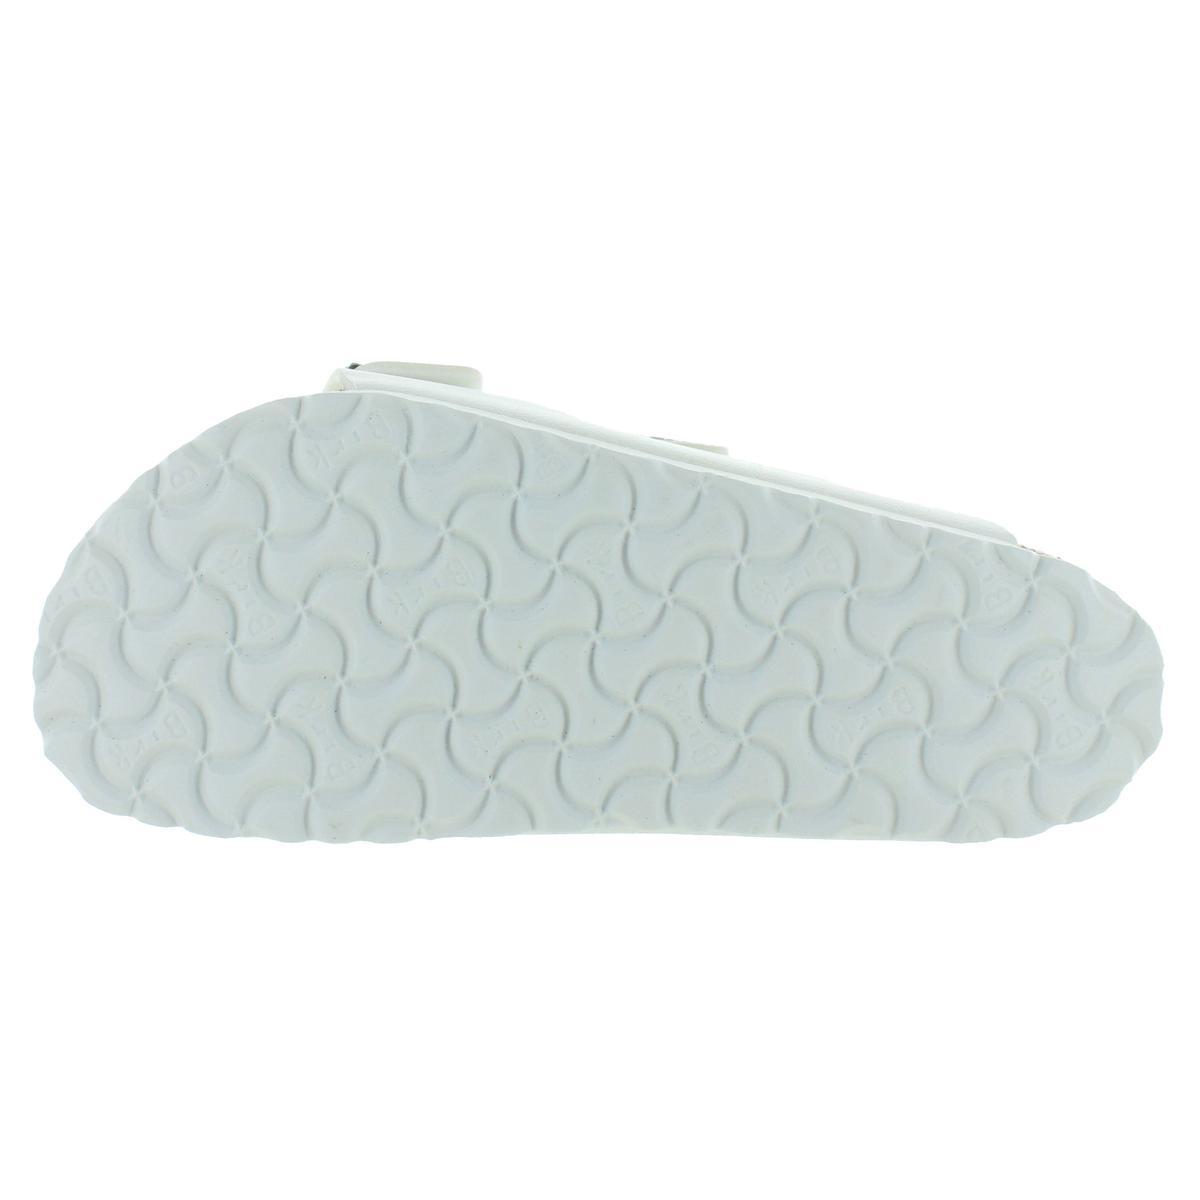 Birkenstock-Women-039-s-Arizona-Double-Buckle-Cork-Sandals thumbnail 8